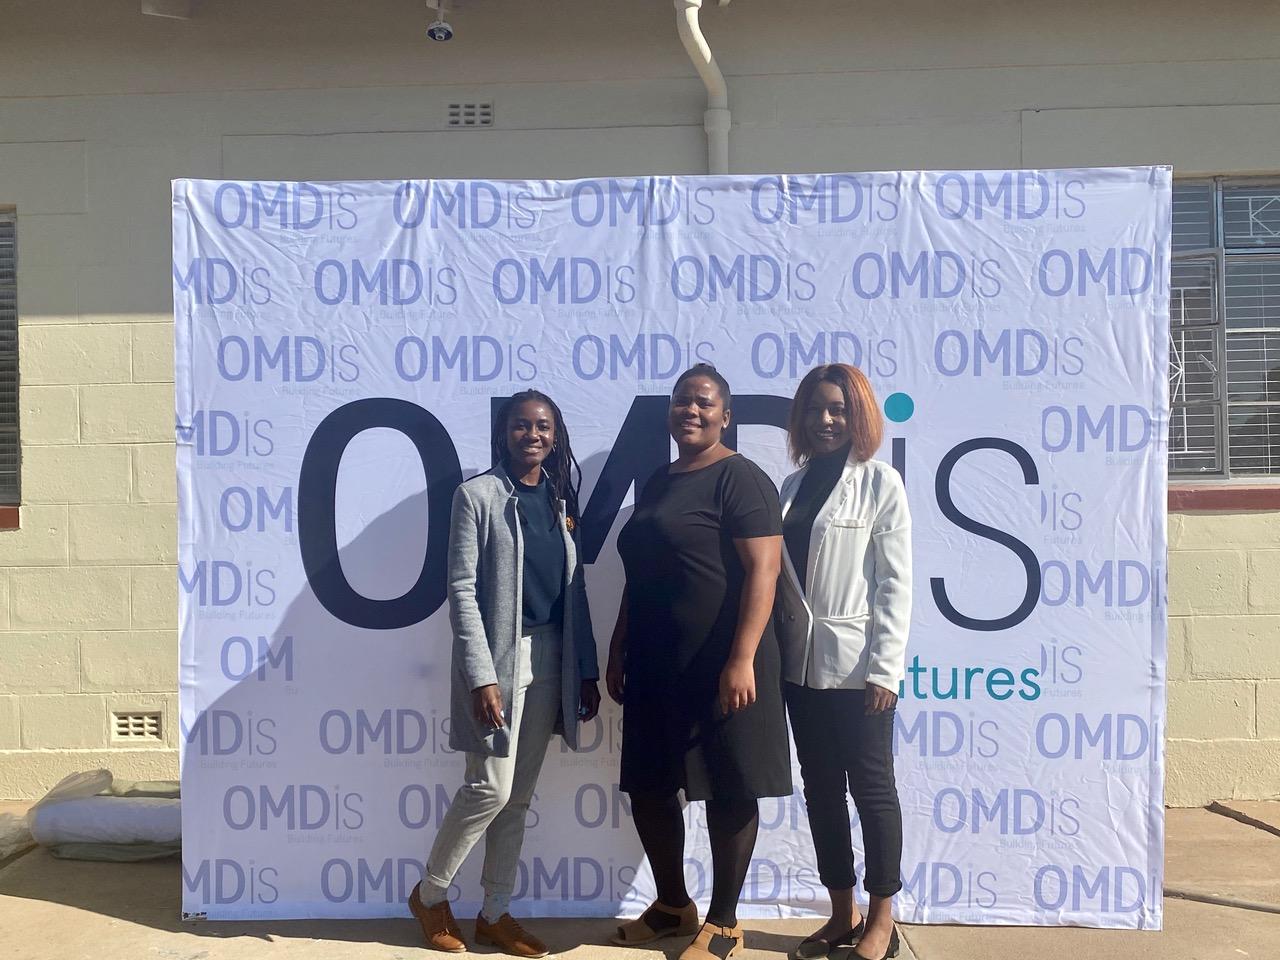 OMDis group